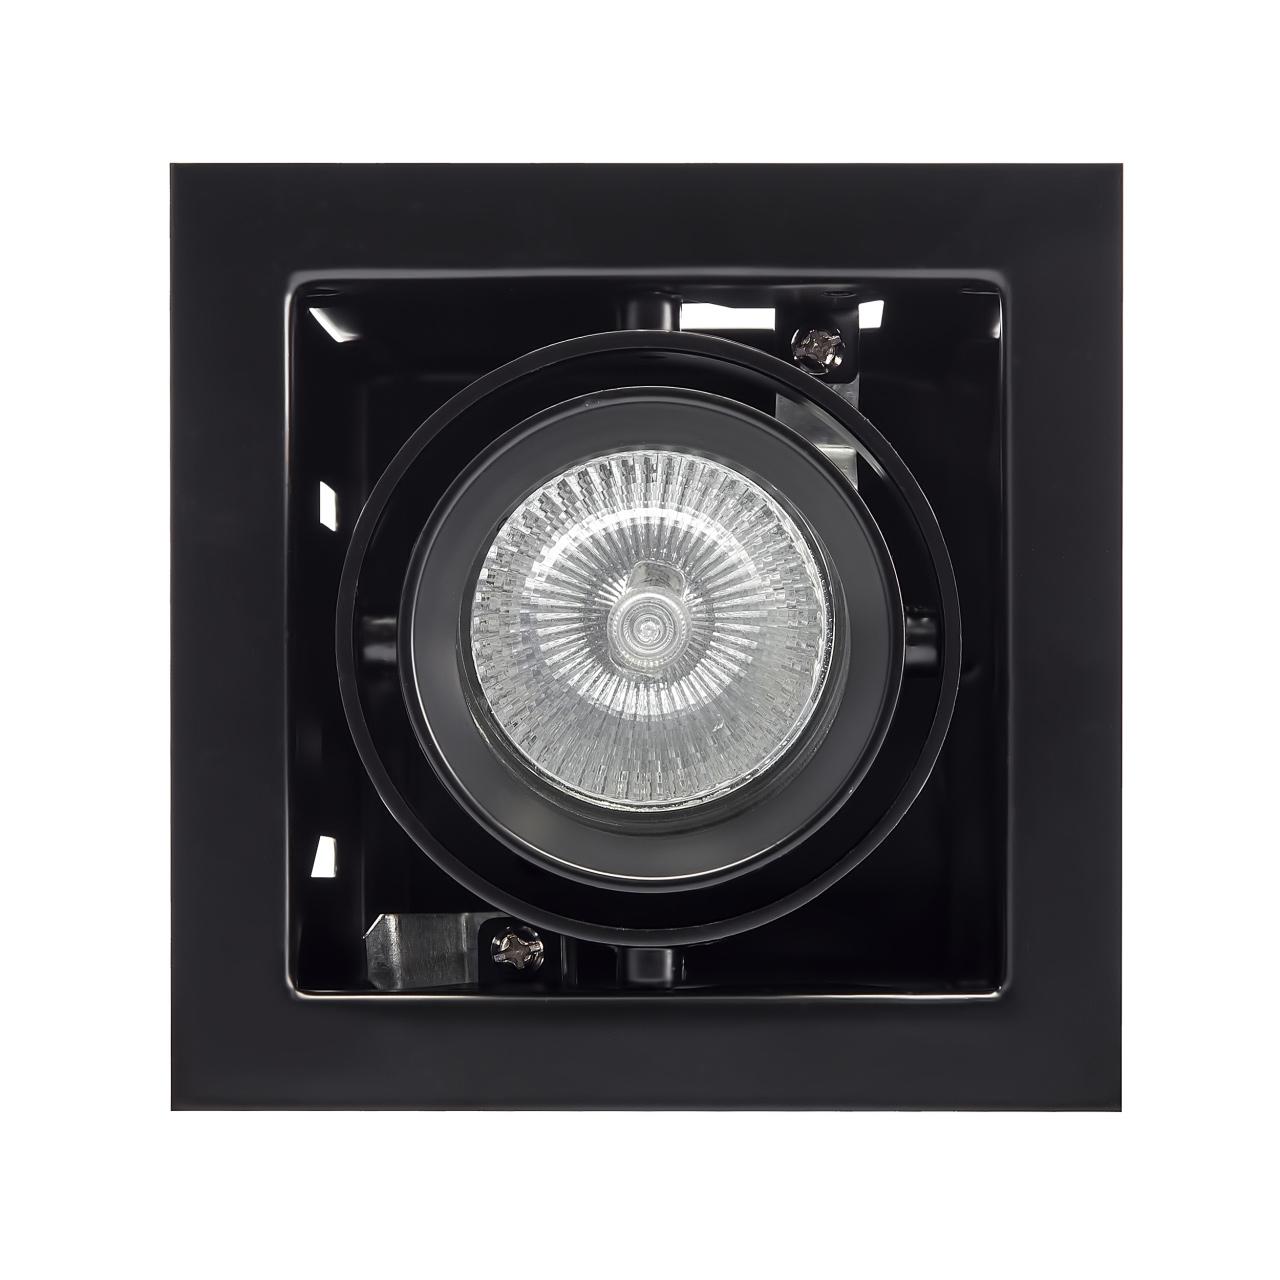 Светильник Cardano 16Х1 MR16 / HP16 черный Lightstar 214018